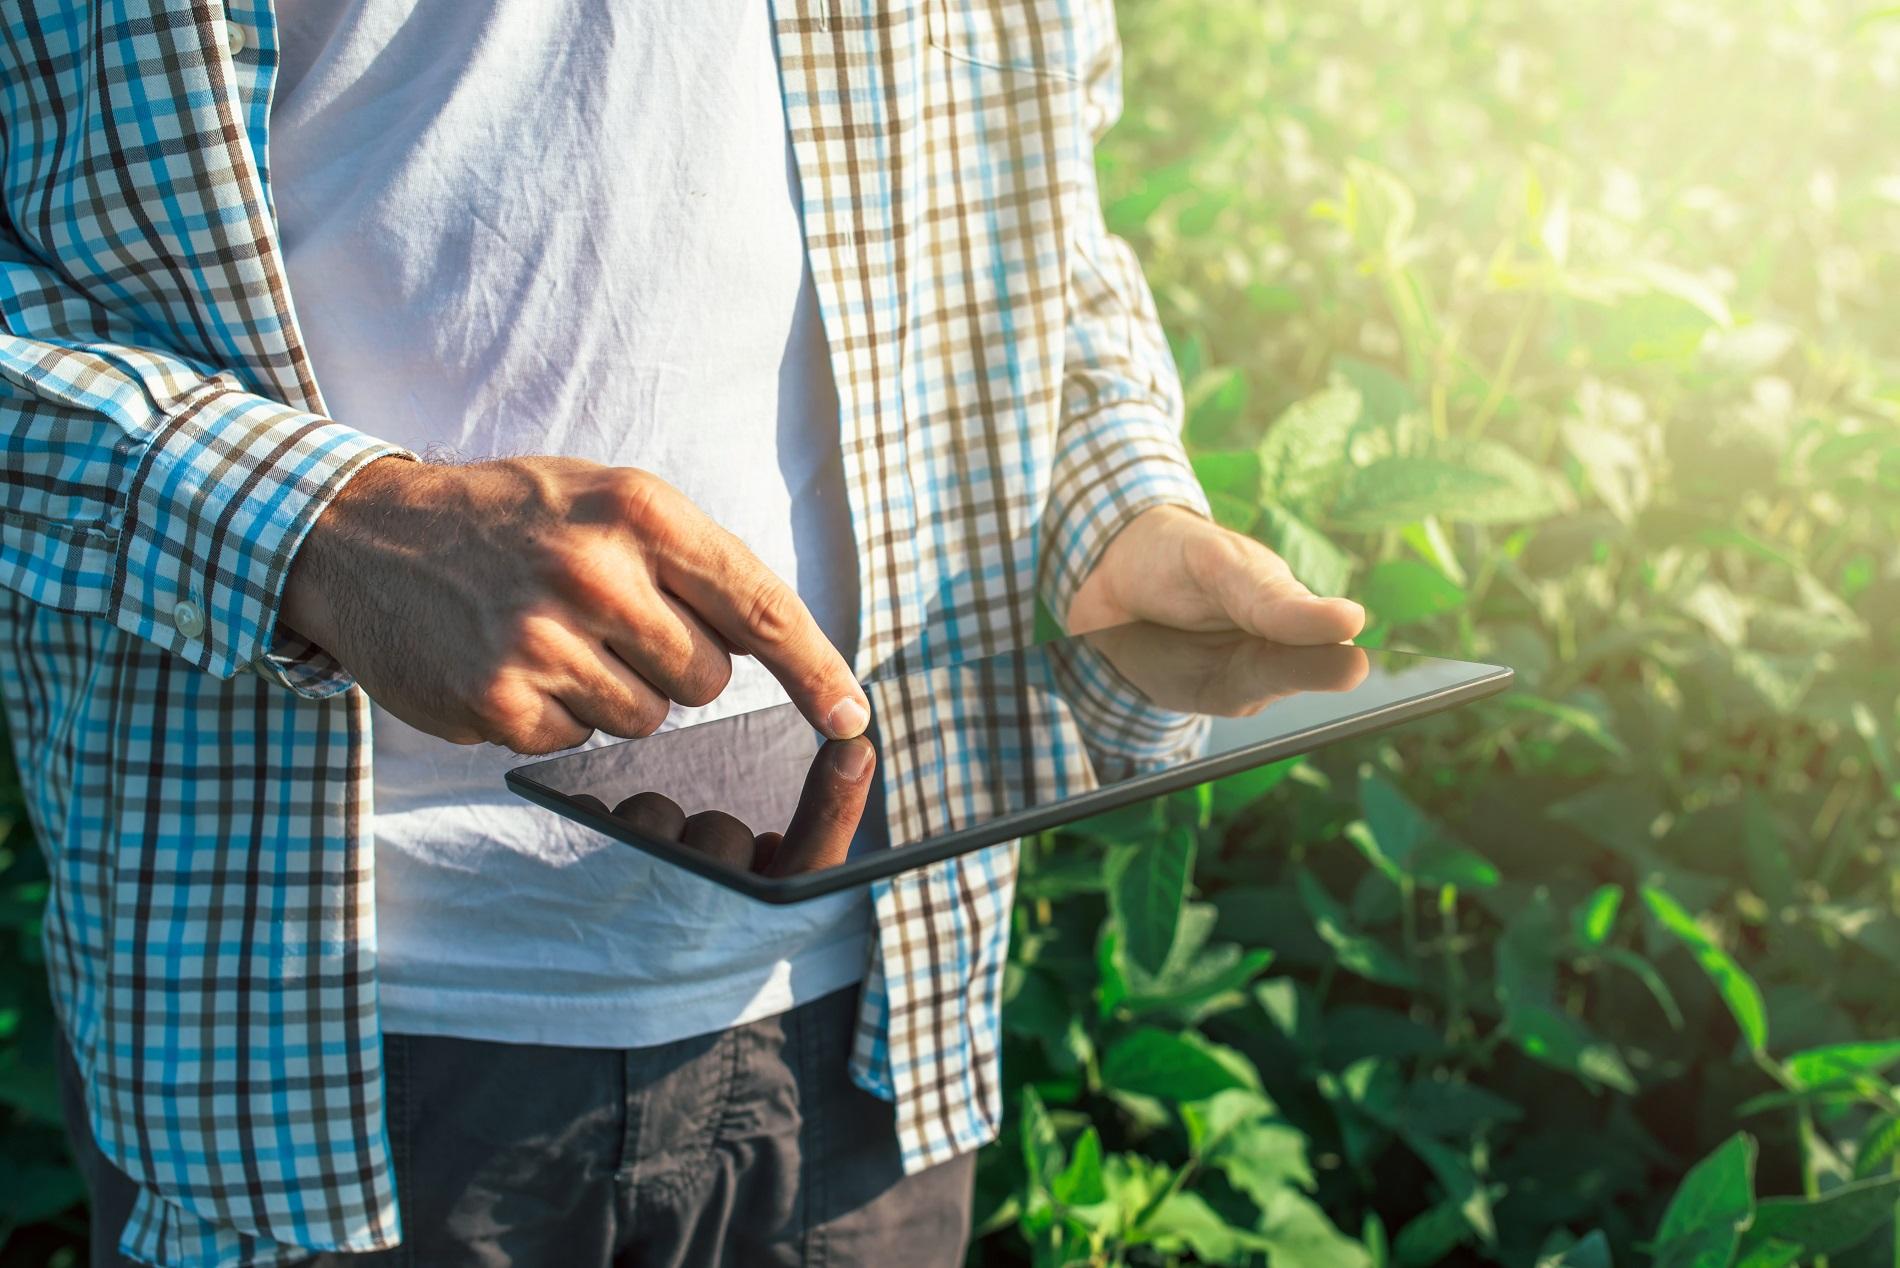 Buenas prácticas agrícolas: Cumplimentación de tu Cuaderno de Explotación